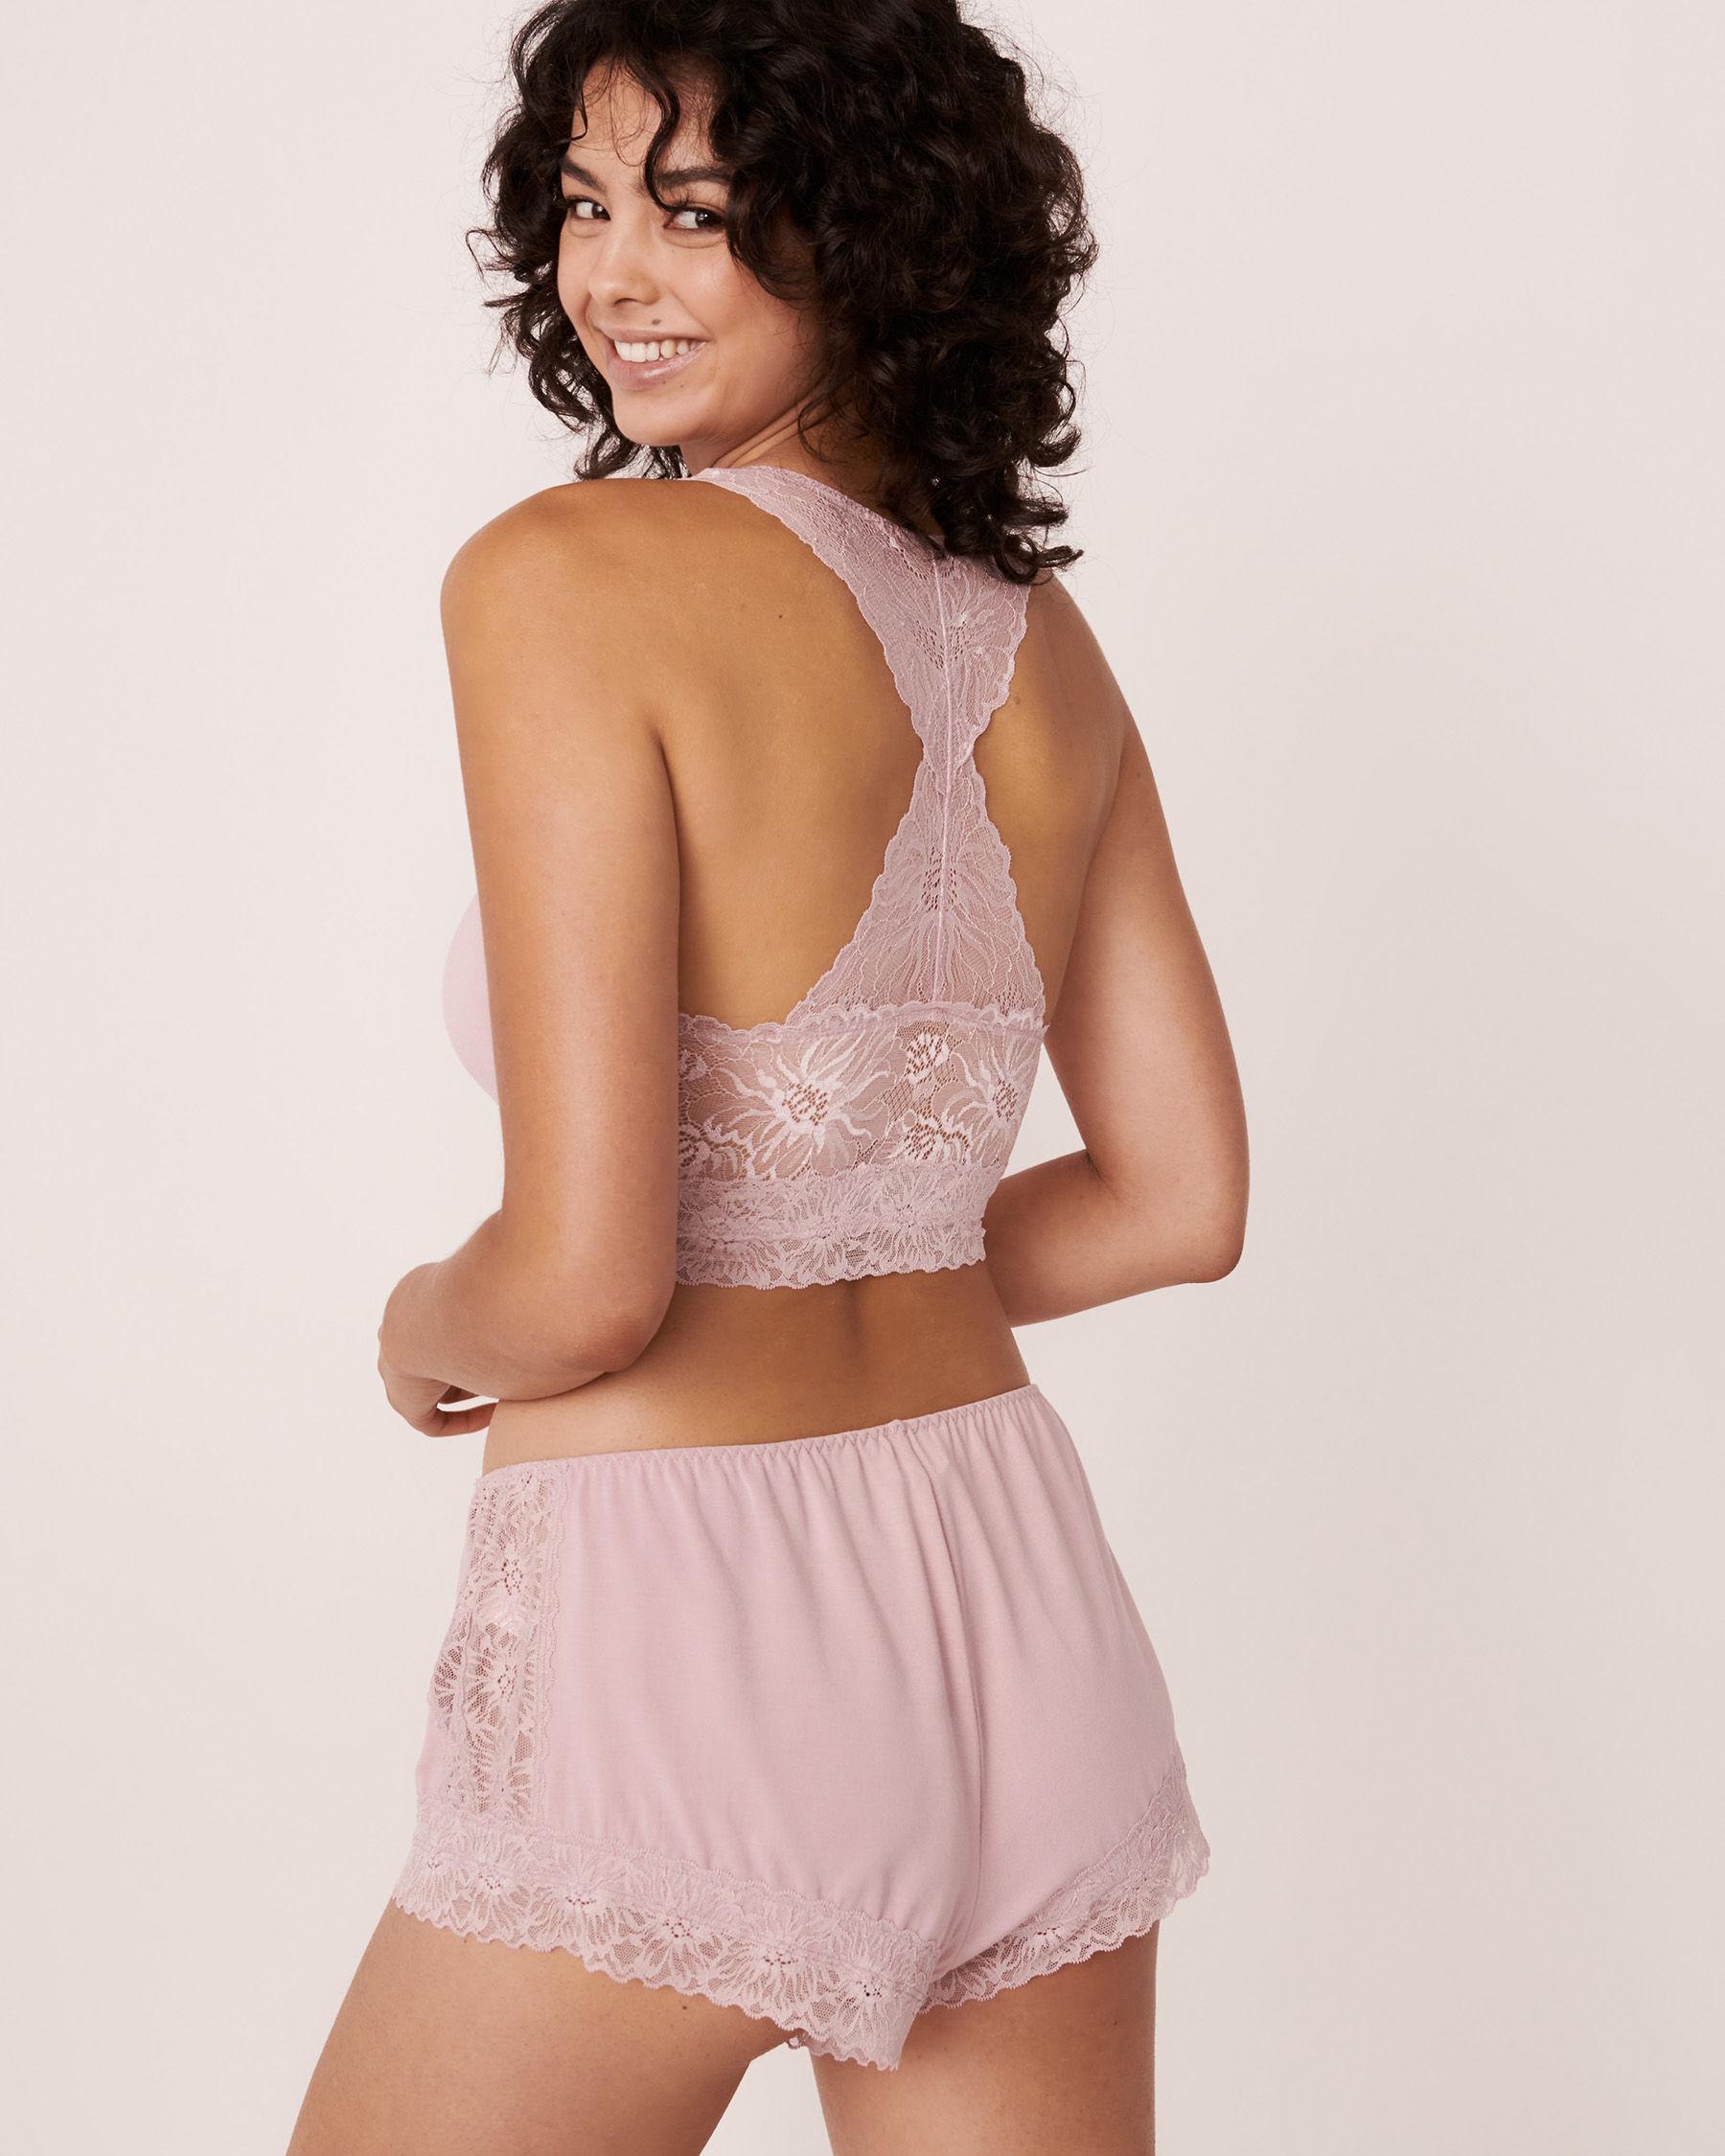 LA VIE EN ROSE Modal Lace Back Crop Cami Lilac 40100146 - View1